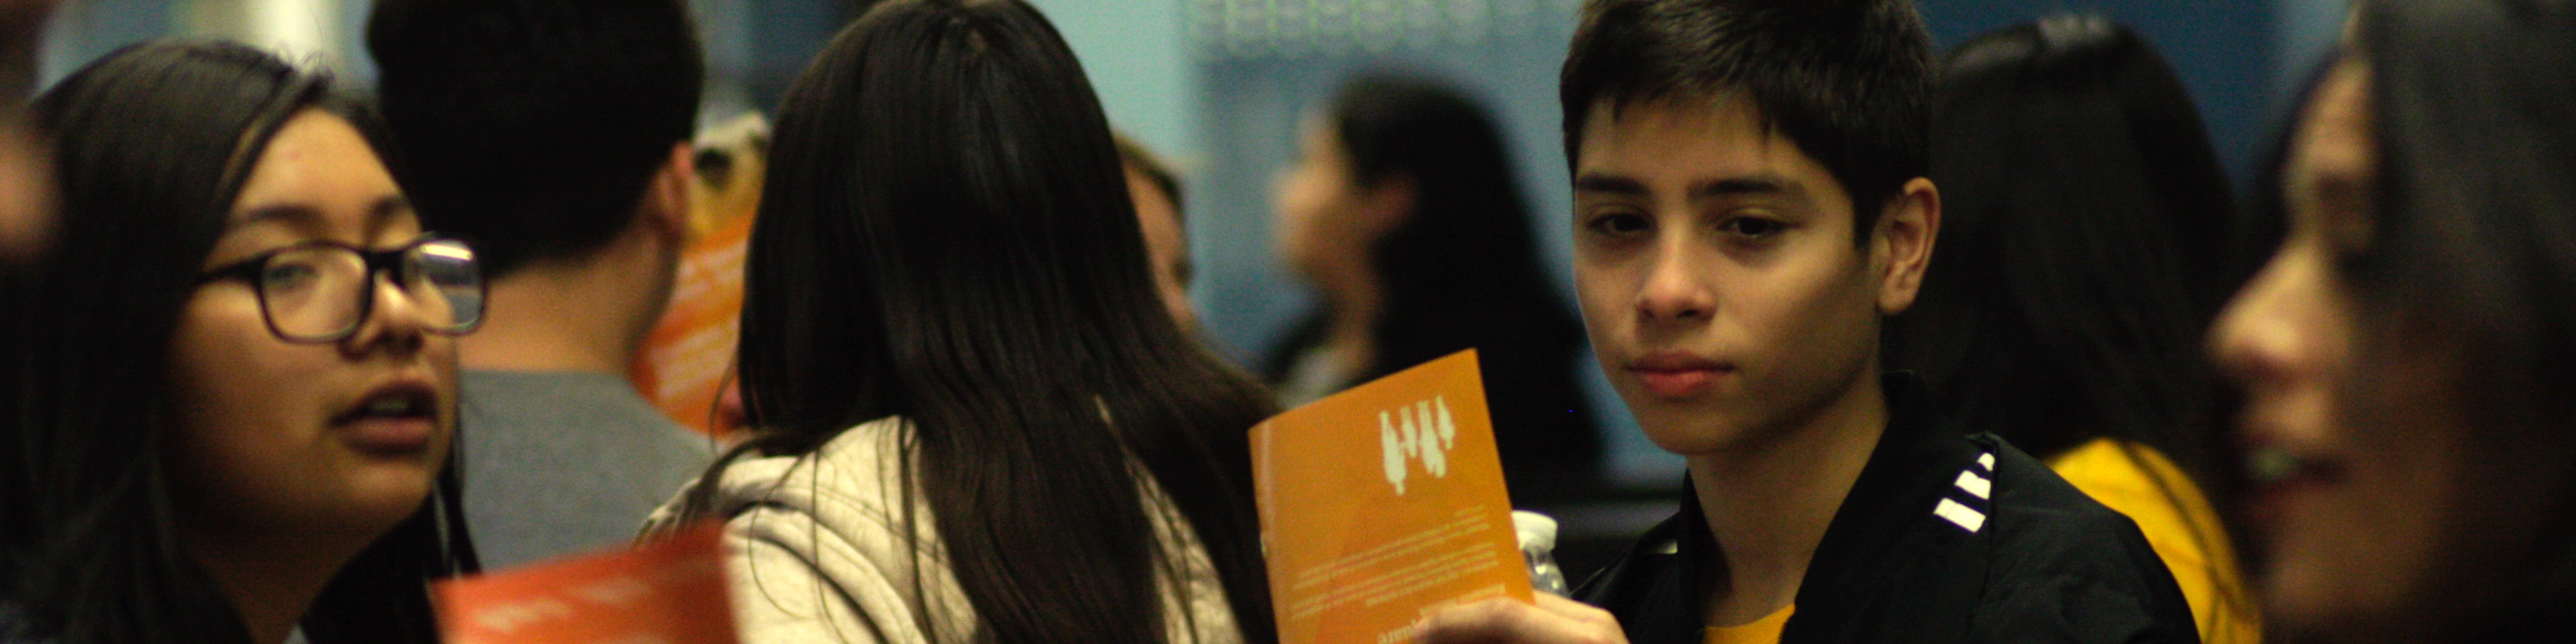 Students - Latinos Progresando